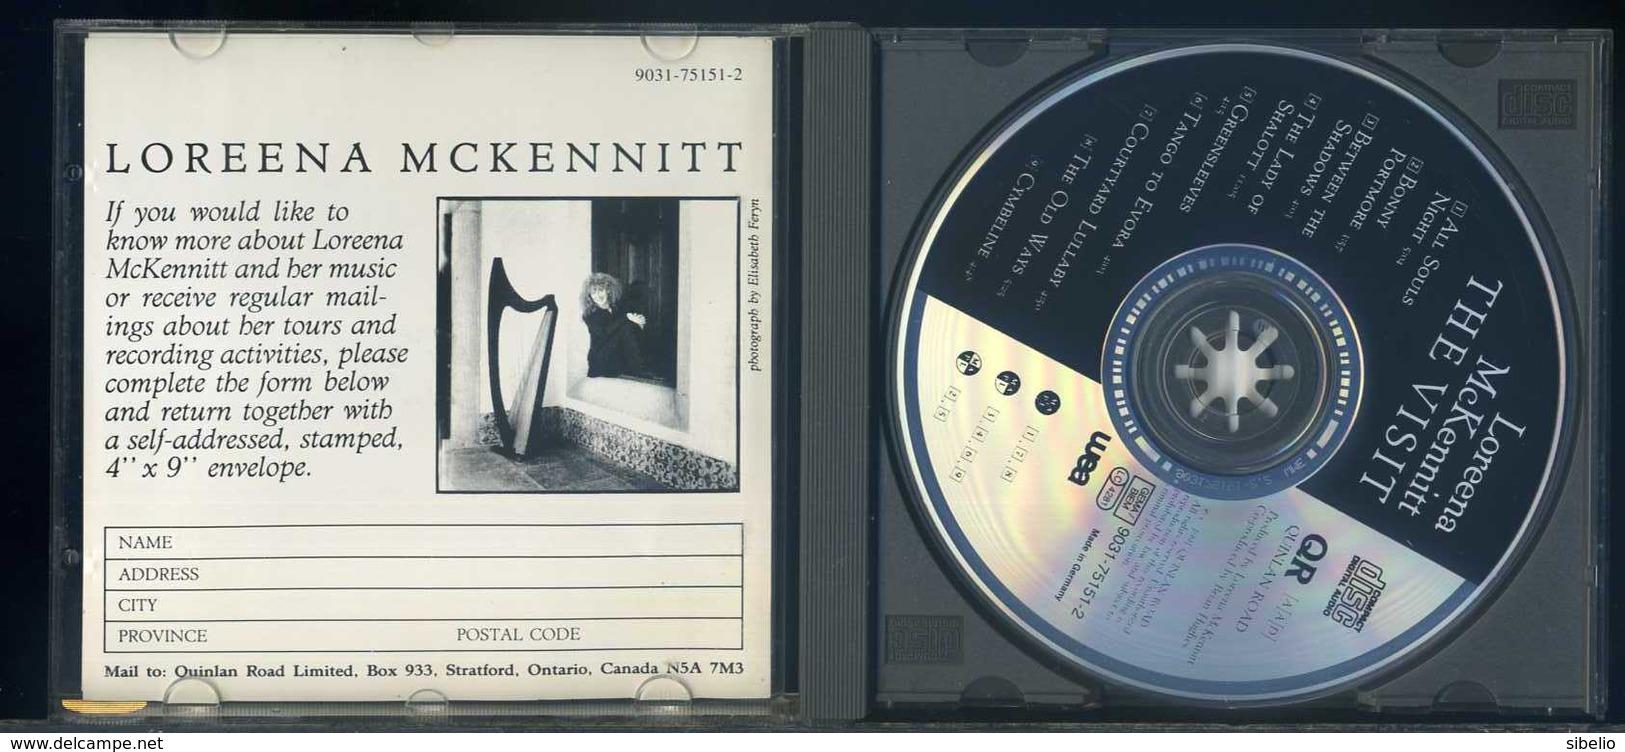 Loreena McKennitt - The Visit - 1CD - Country & Folk